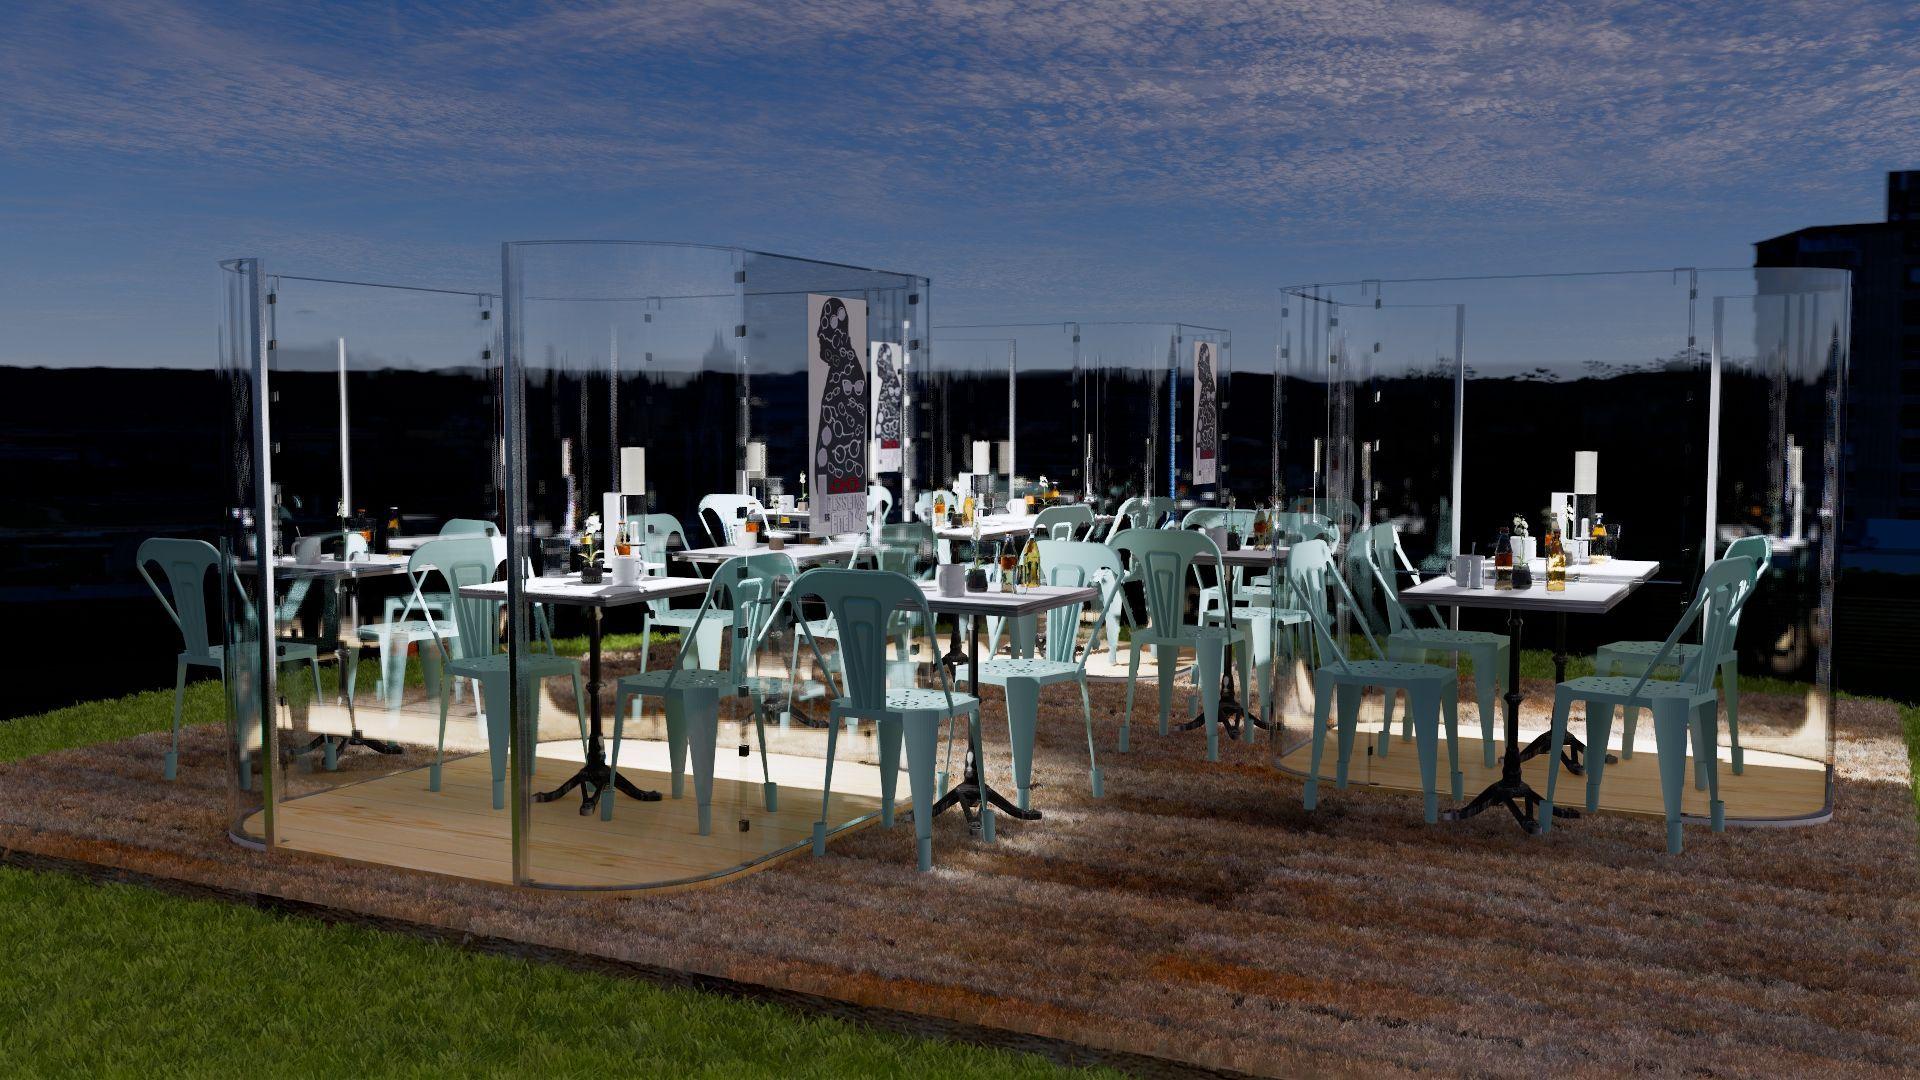 plexi-corner-solution-innovante-reouverture-bars-restaurants-cafés